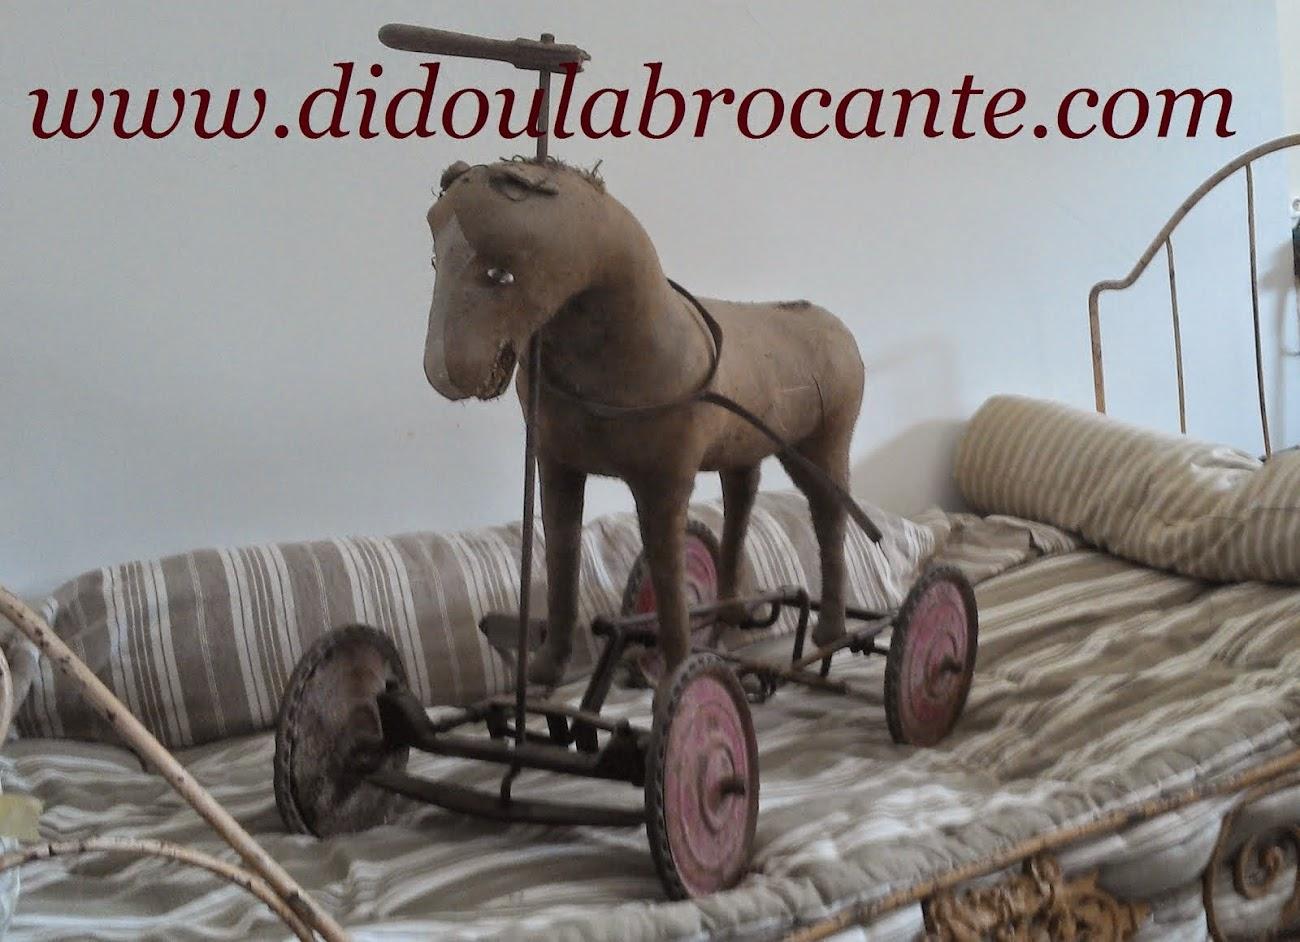 www.didoulabrocante.com